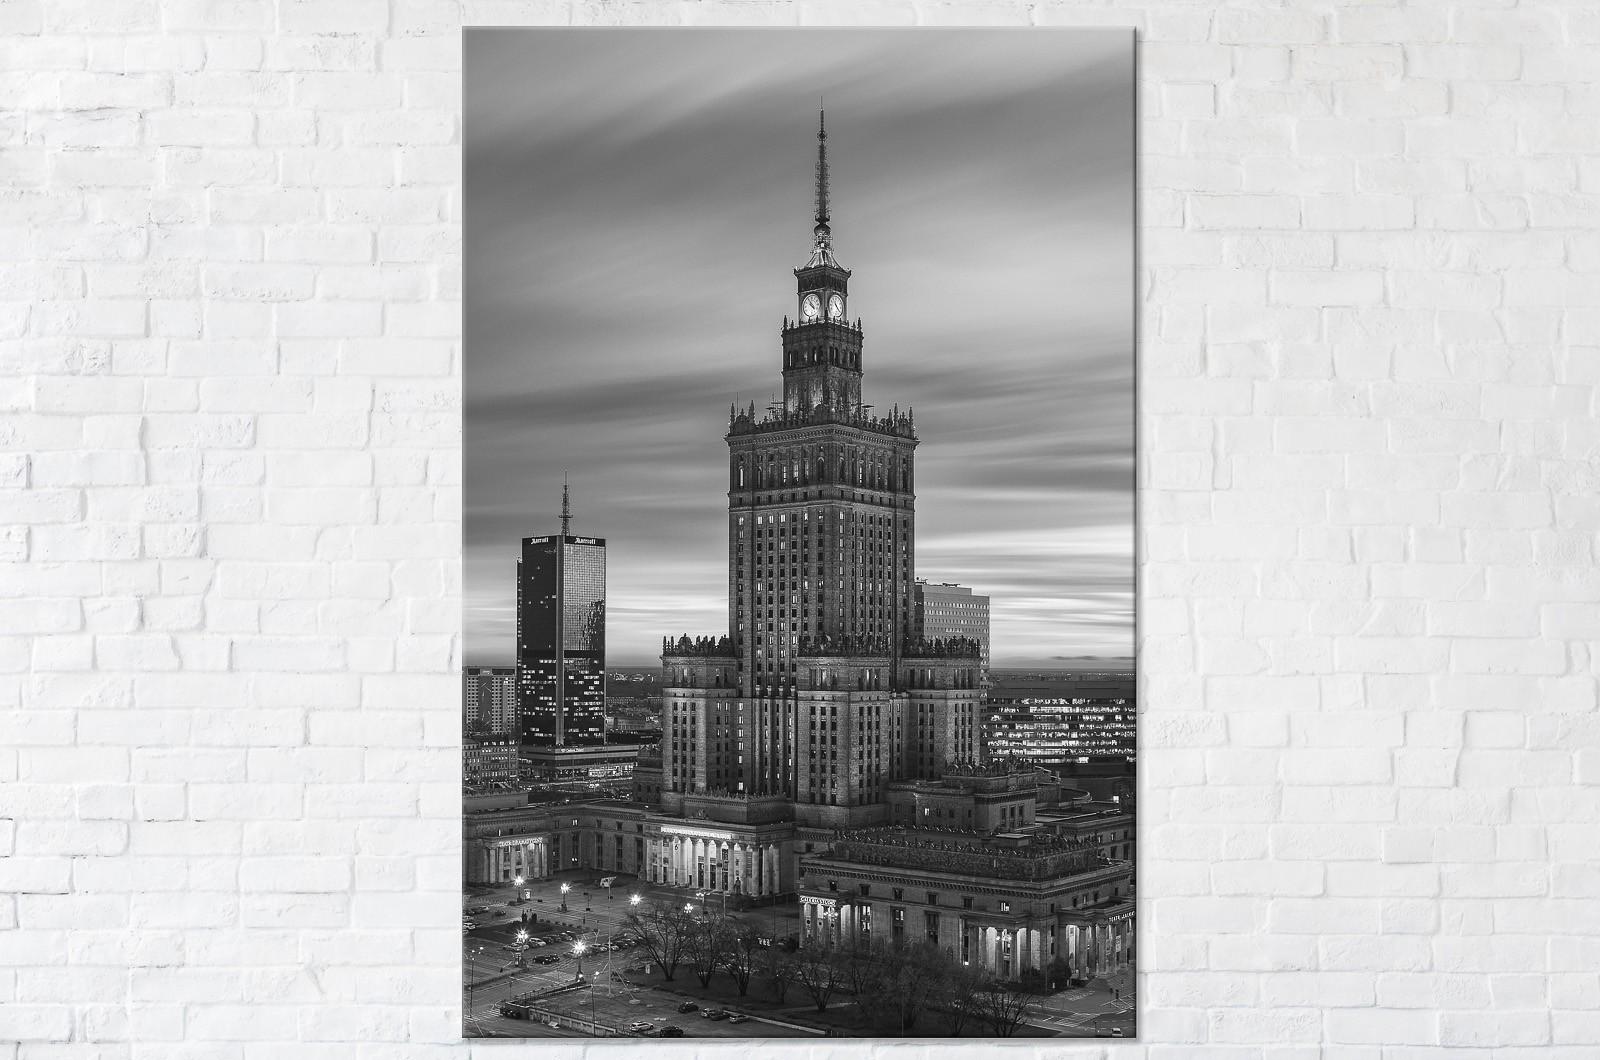 Nostalgiczny Pałac Kultury i Nauki Fotoobraz